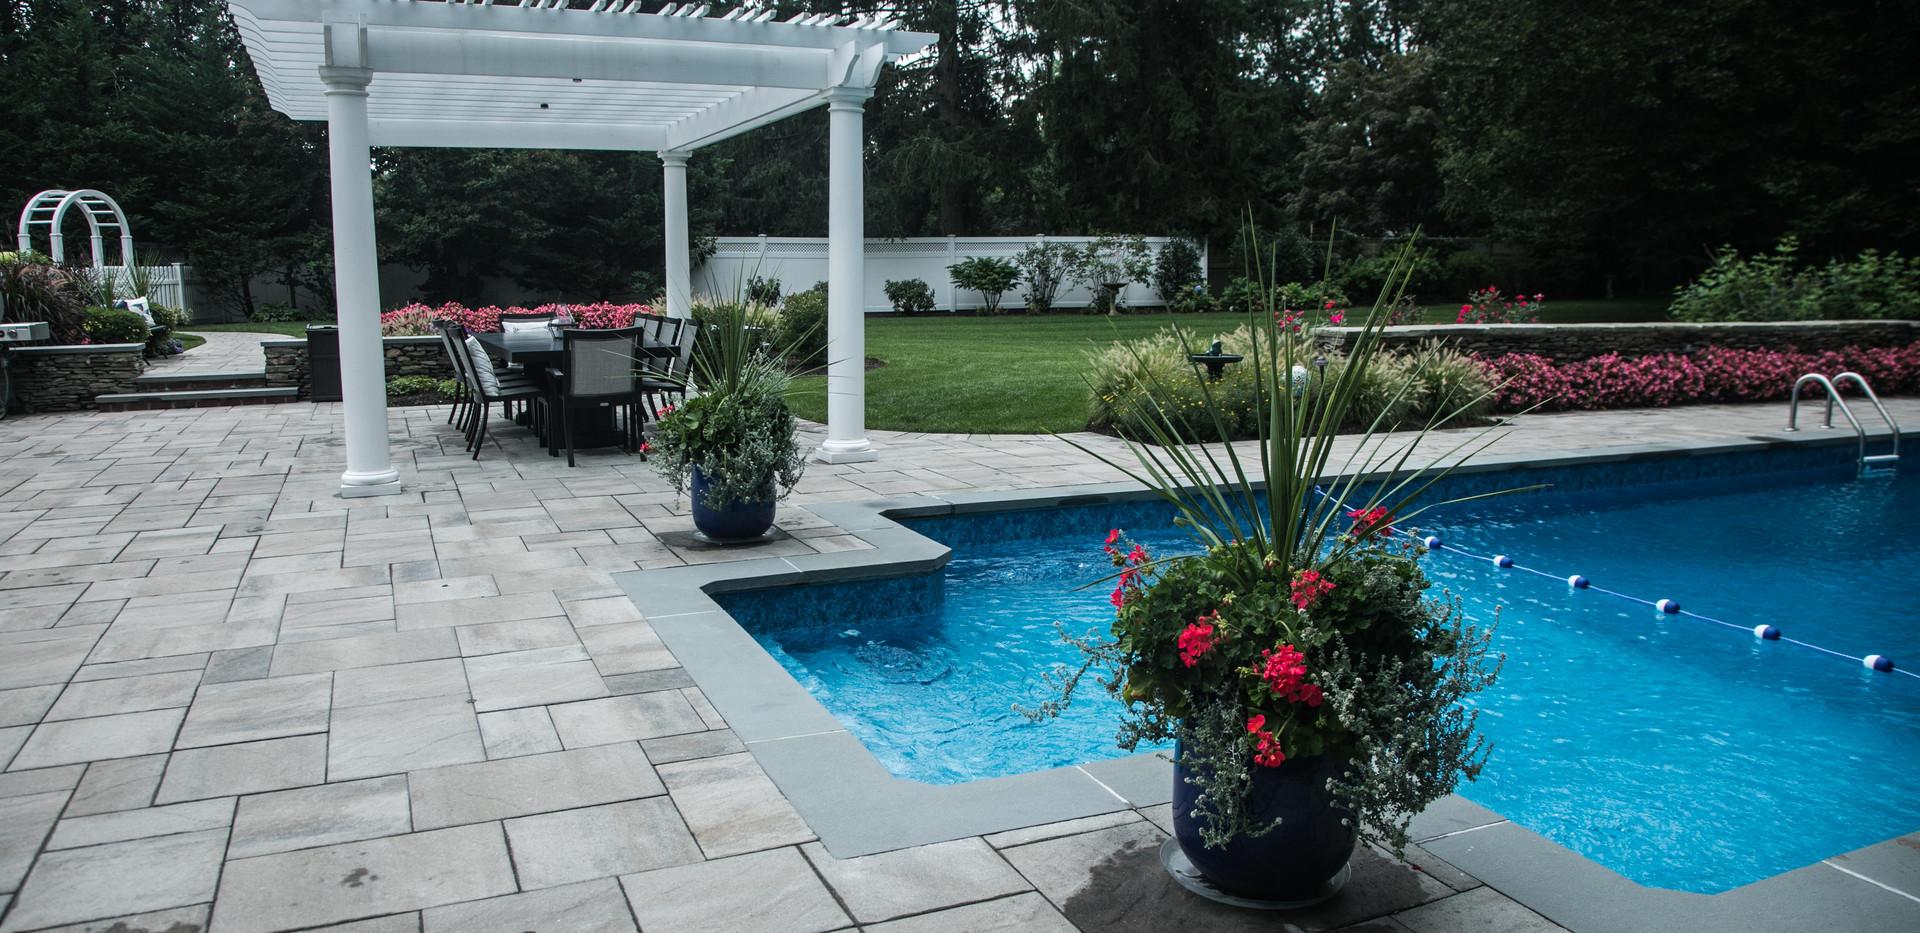 Custom pools, pavers and pergolas